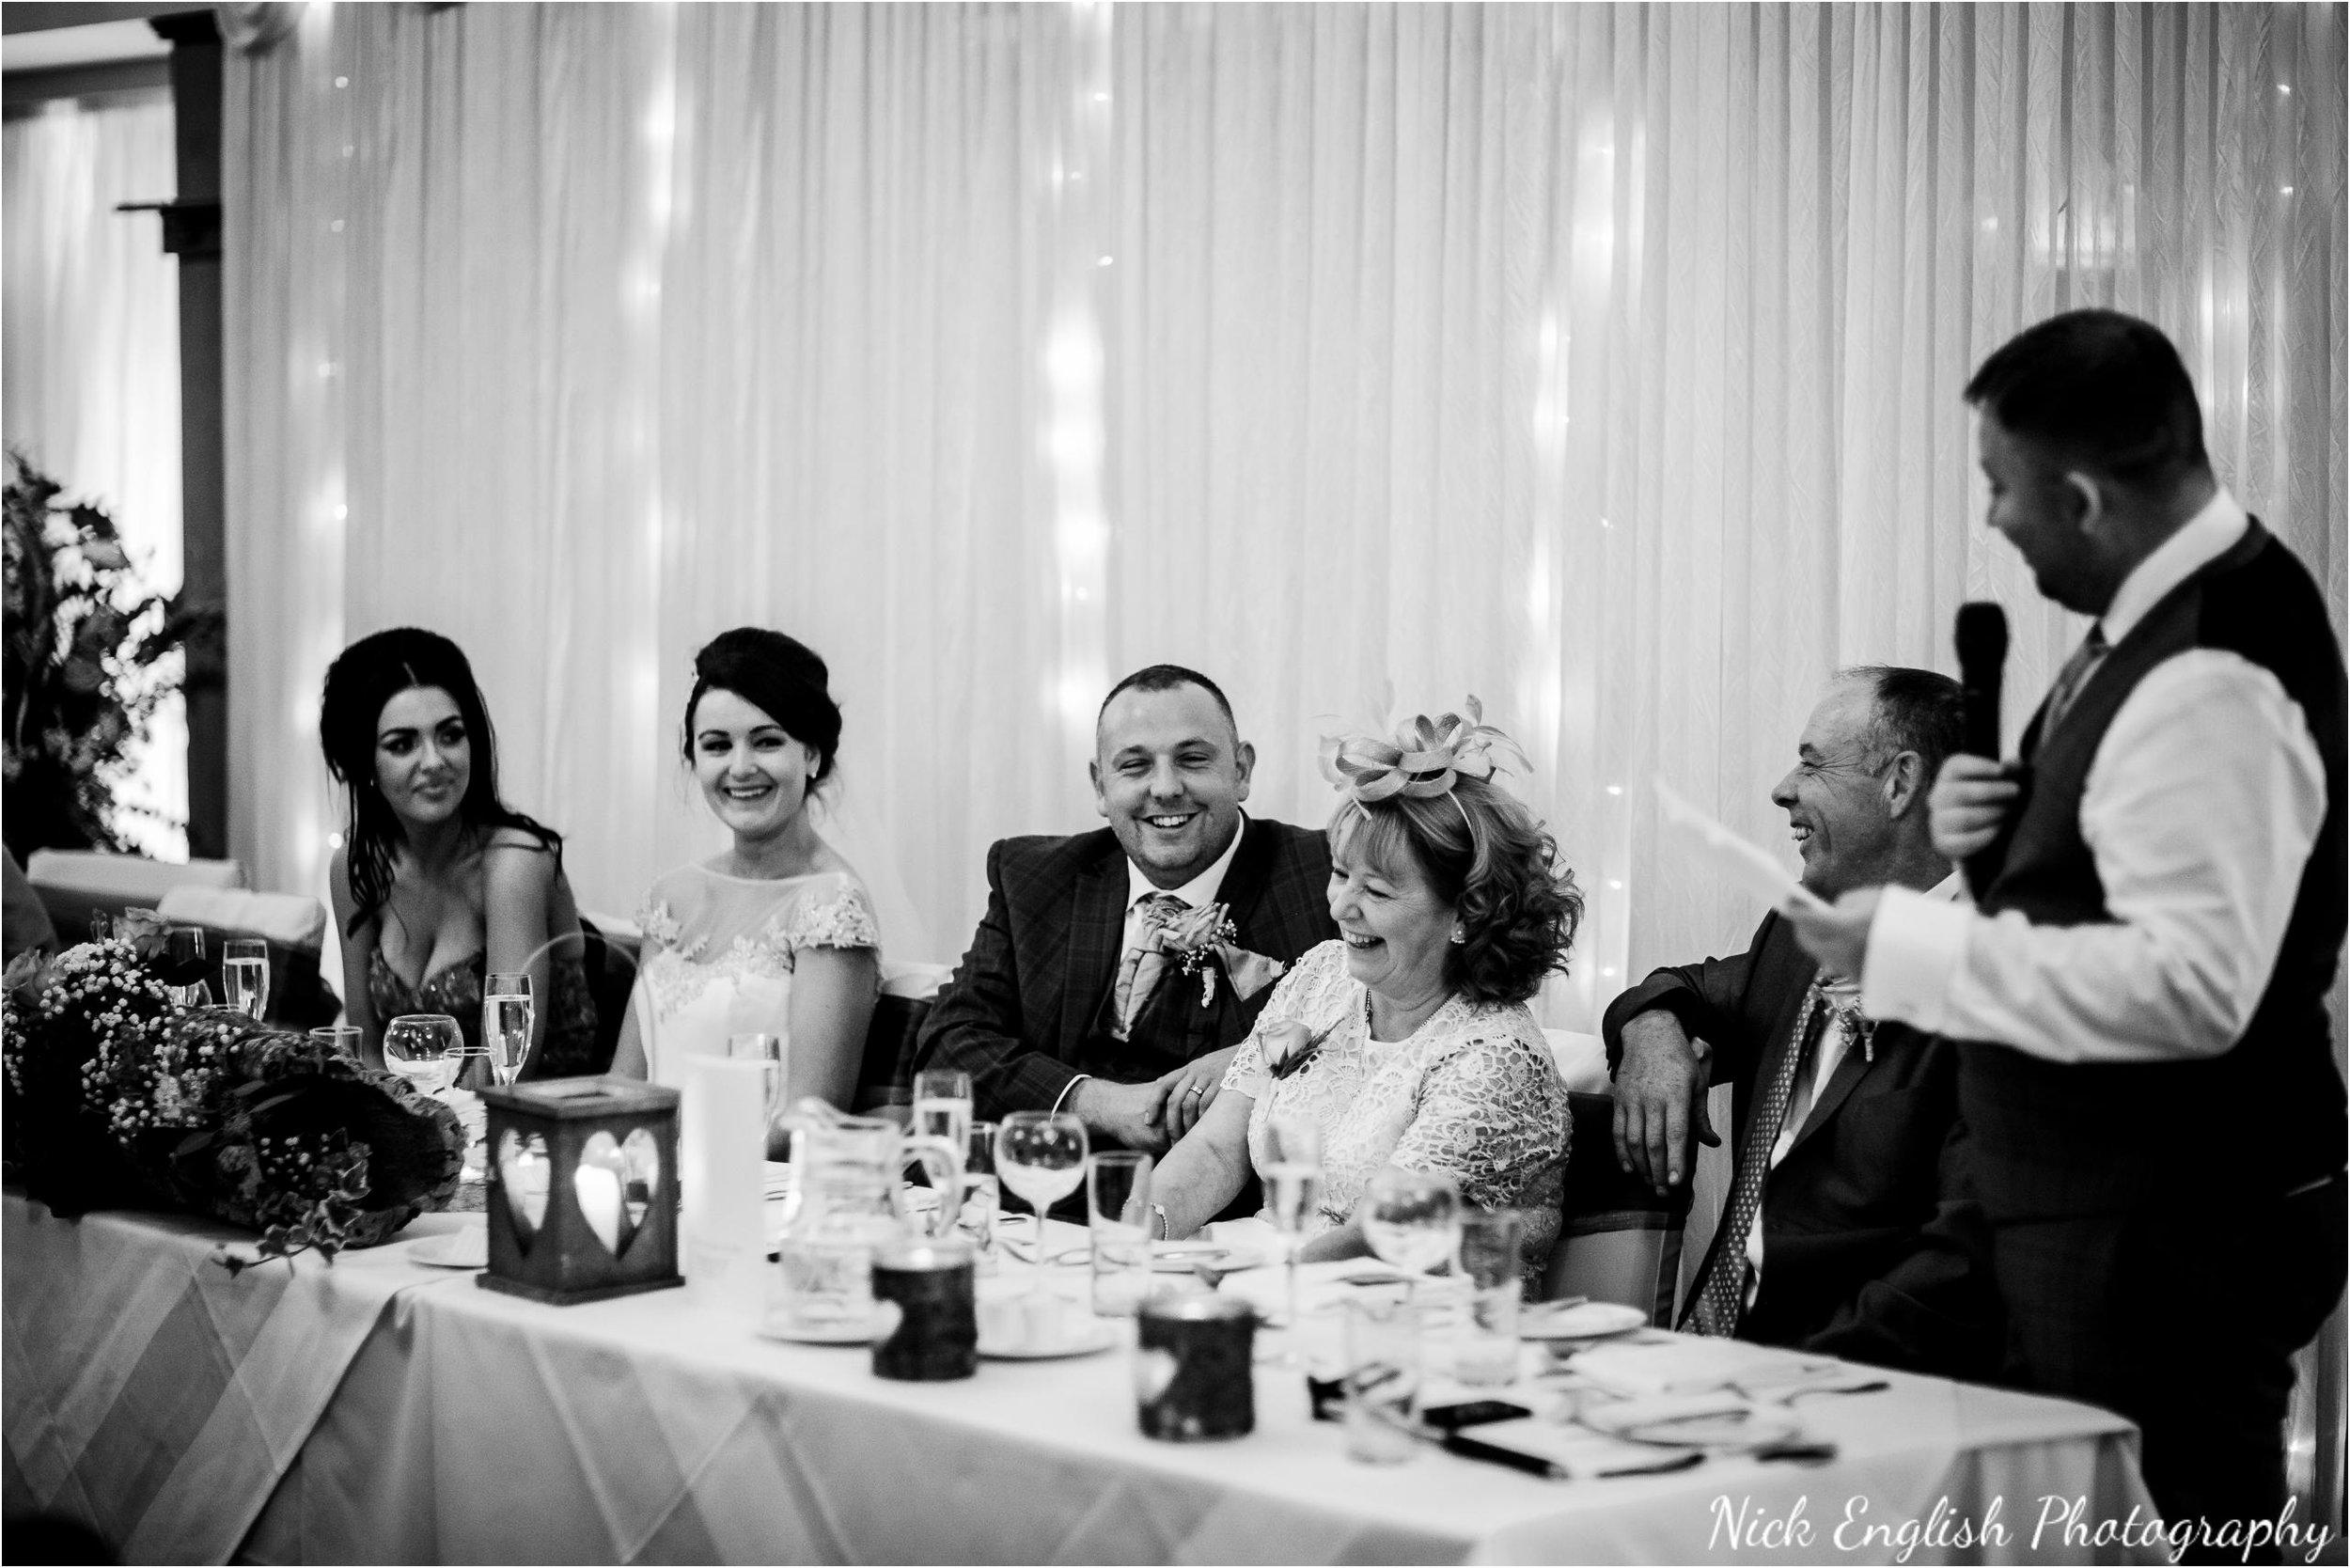 Stacey-Ash-Wedding-Photographs-Stanley-House-Preston-Lancashire-179.jpg